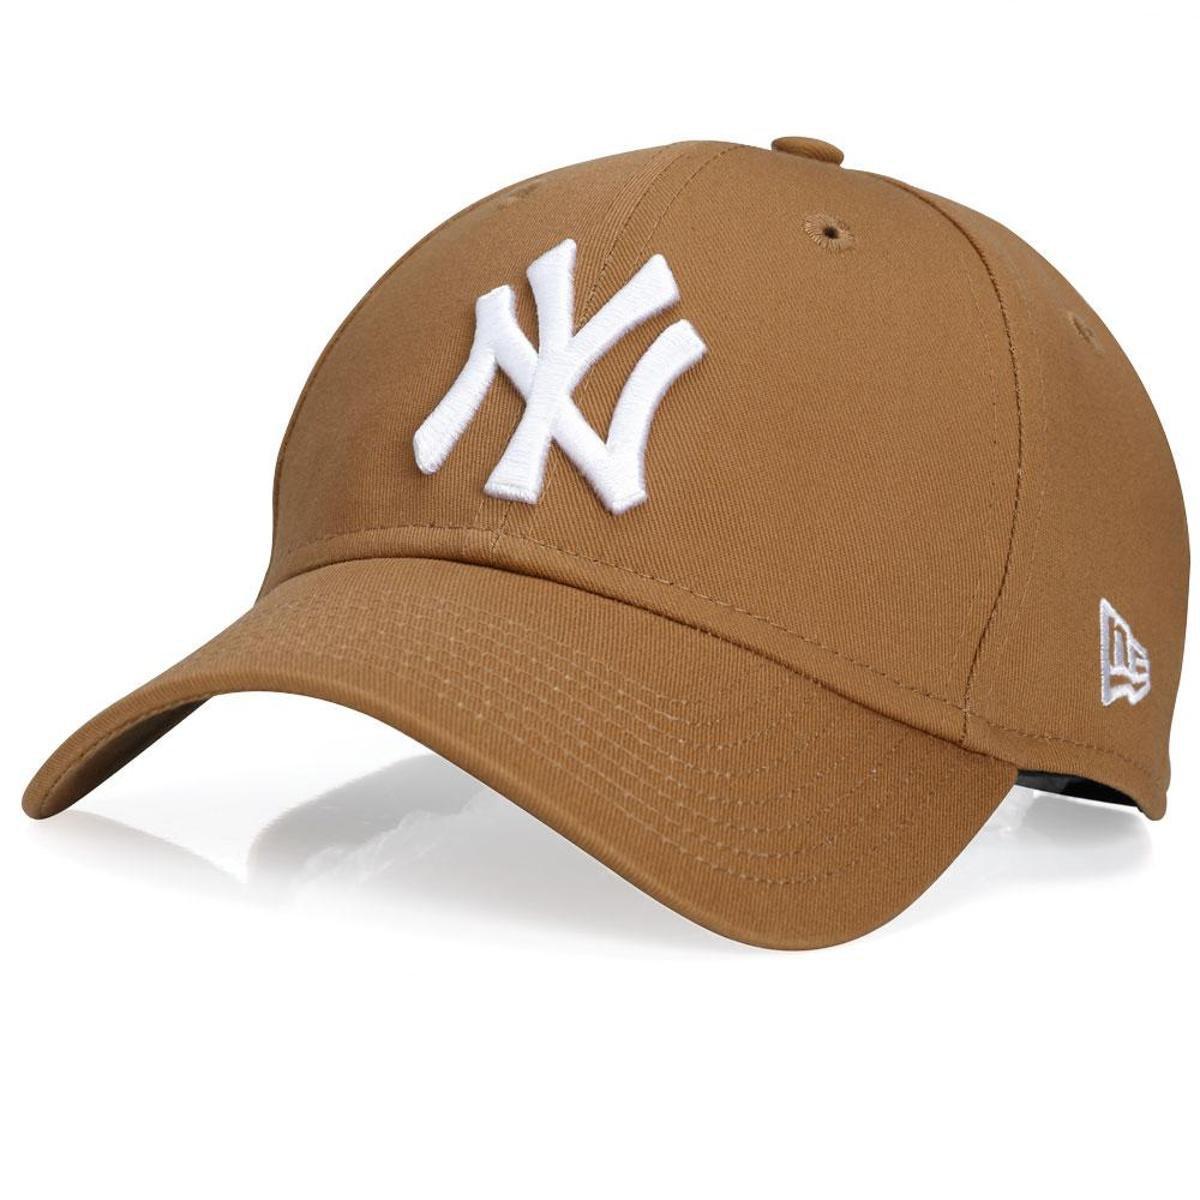 1325d5dda7 ... Boné New York Yankees 940 White on Wheat - New Era - Compre Agora .